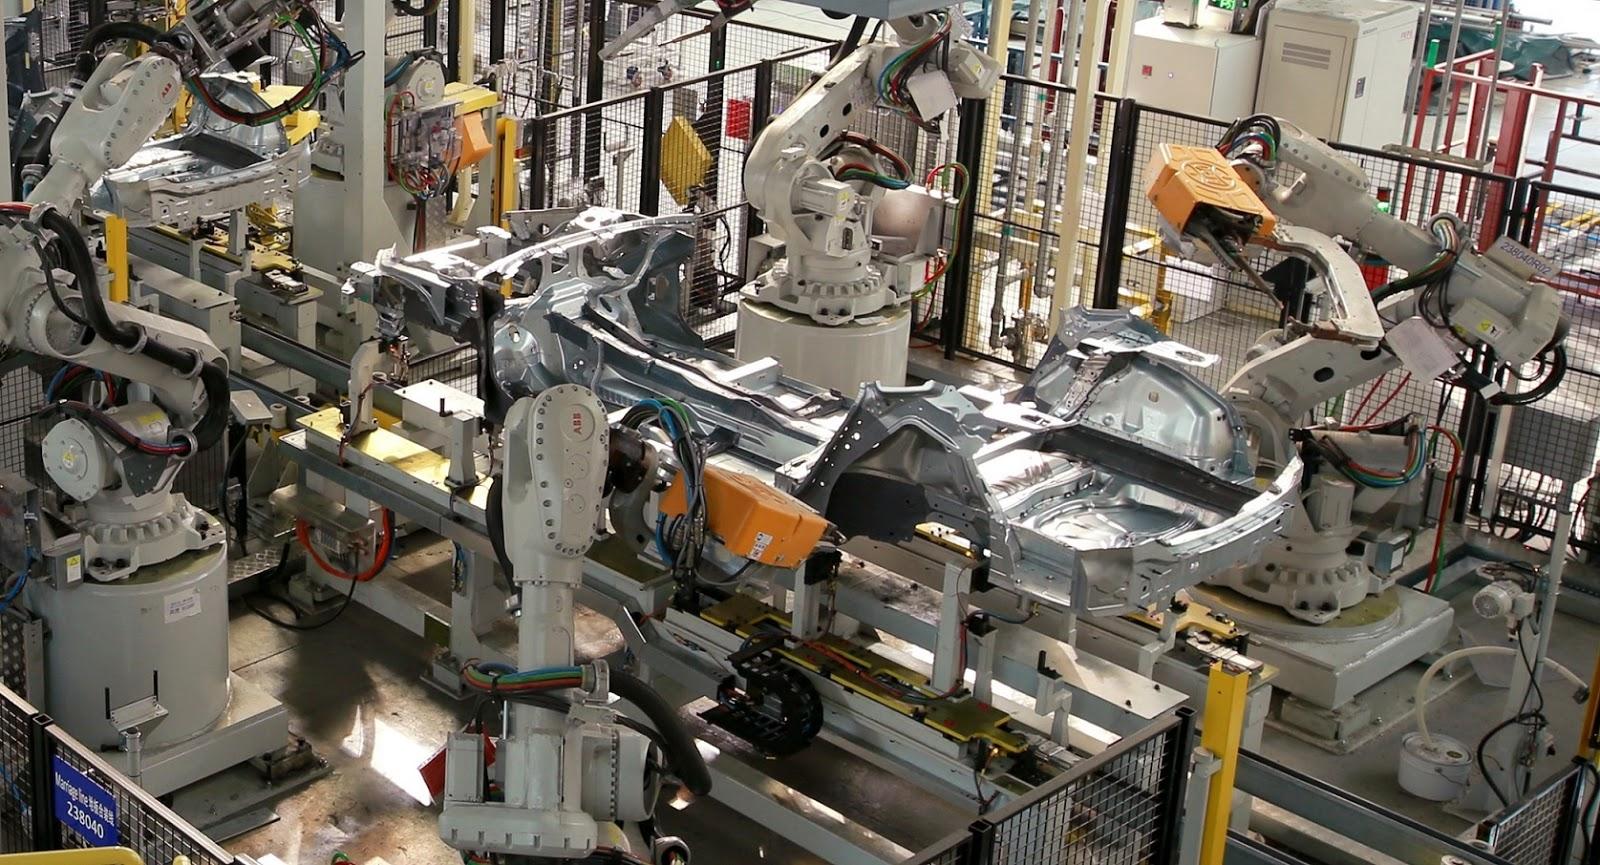 VOLVO NEW2BMANUFACTURING2BSTRATEGY2B3 H Volvo αυξάνει την παραγωγή της και αλλάζει στρατηγική για τα εργοστάσιά της σε Ευρώπη, Κίνα, ΗΠΑ Volvo, Volvo Cars, Volvo S90, Volvo S90 Excellence, αγορά, Τεχνολογία